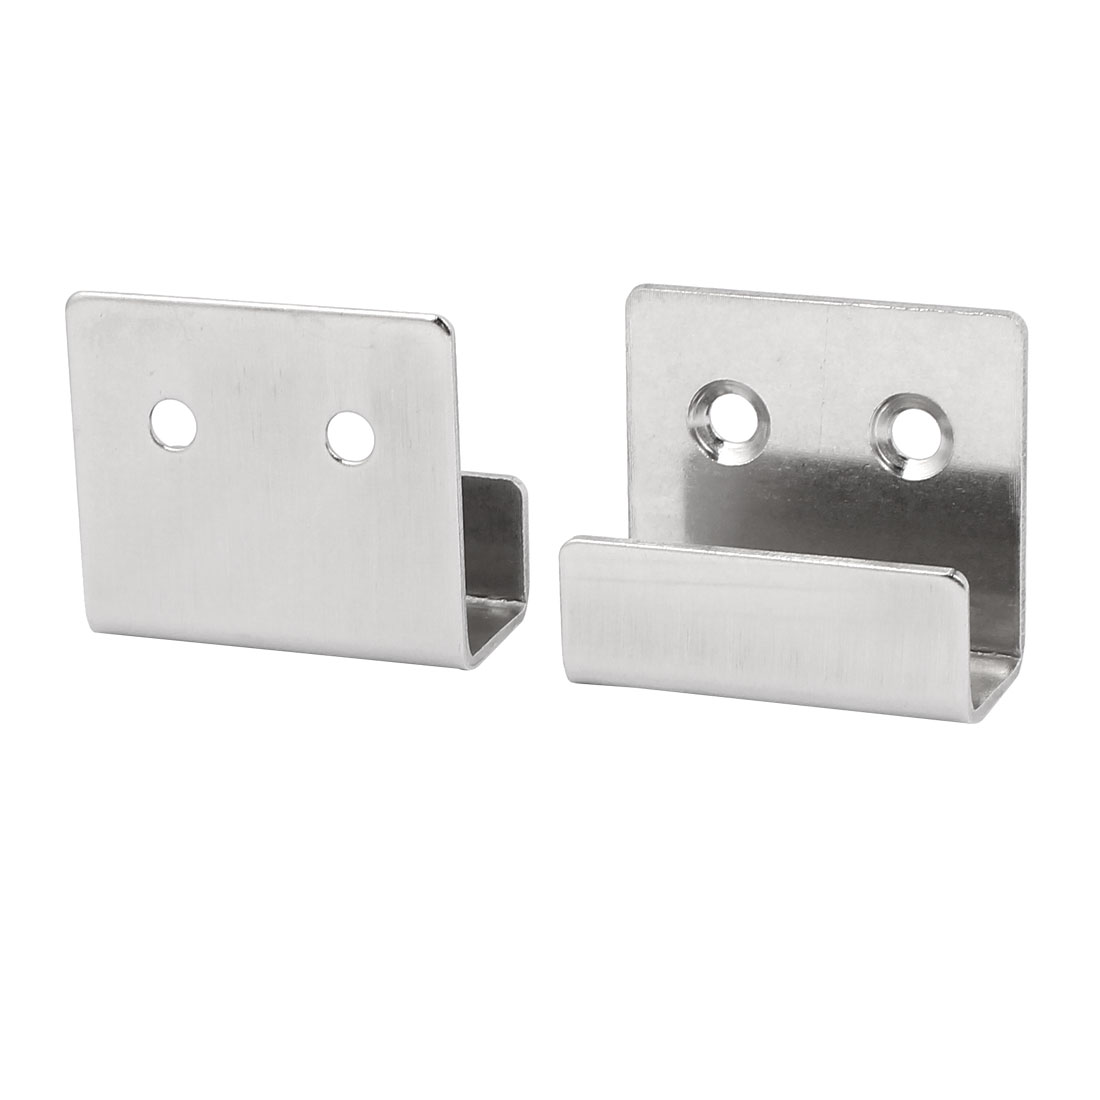 WANXIANG Brushed Stainless Steel Tile Display Hangers Wall Hanger Fastener for Ceramic Tile Display Pack of 8 Inner Width 15mm